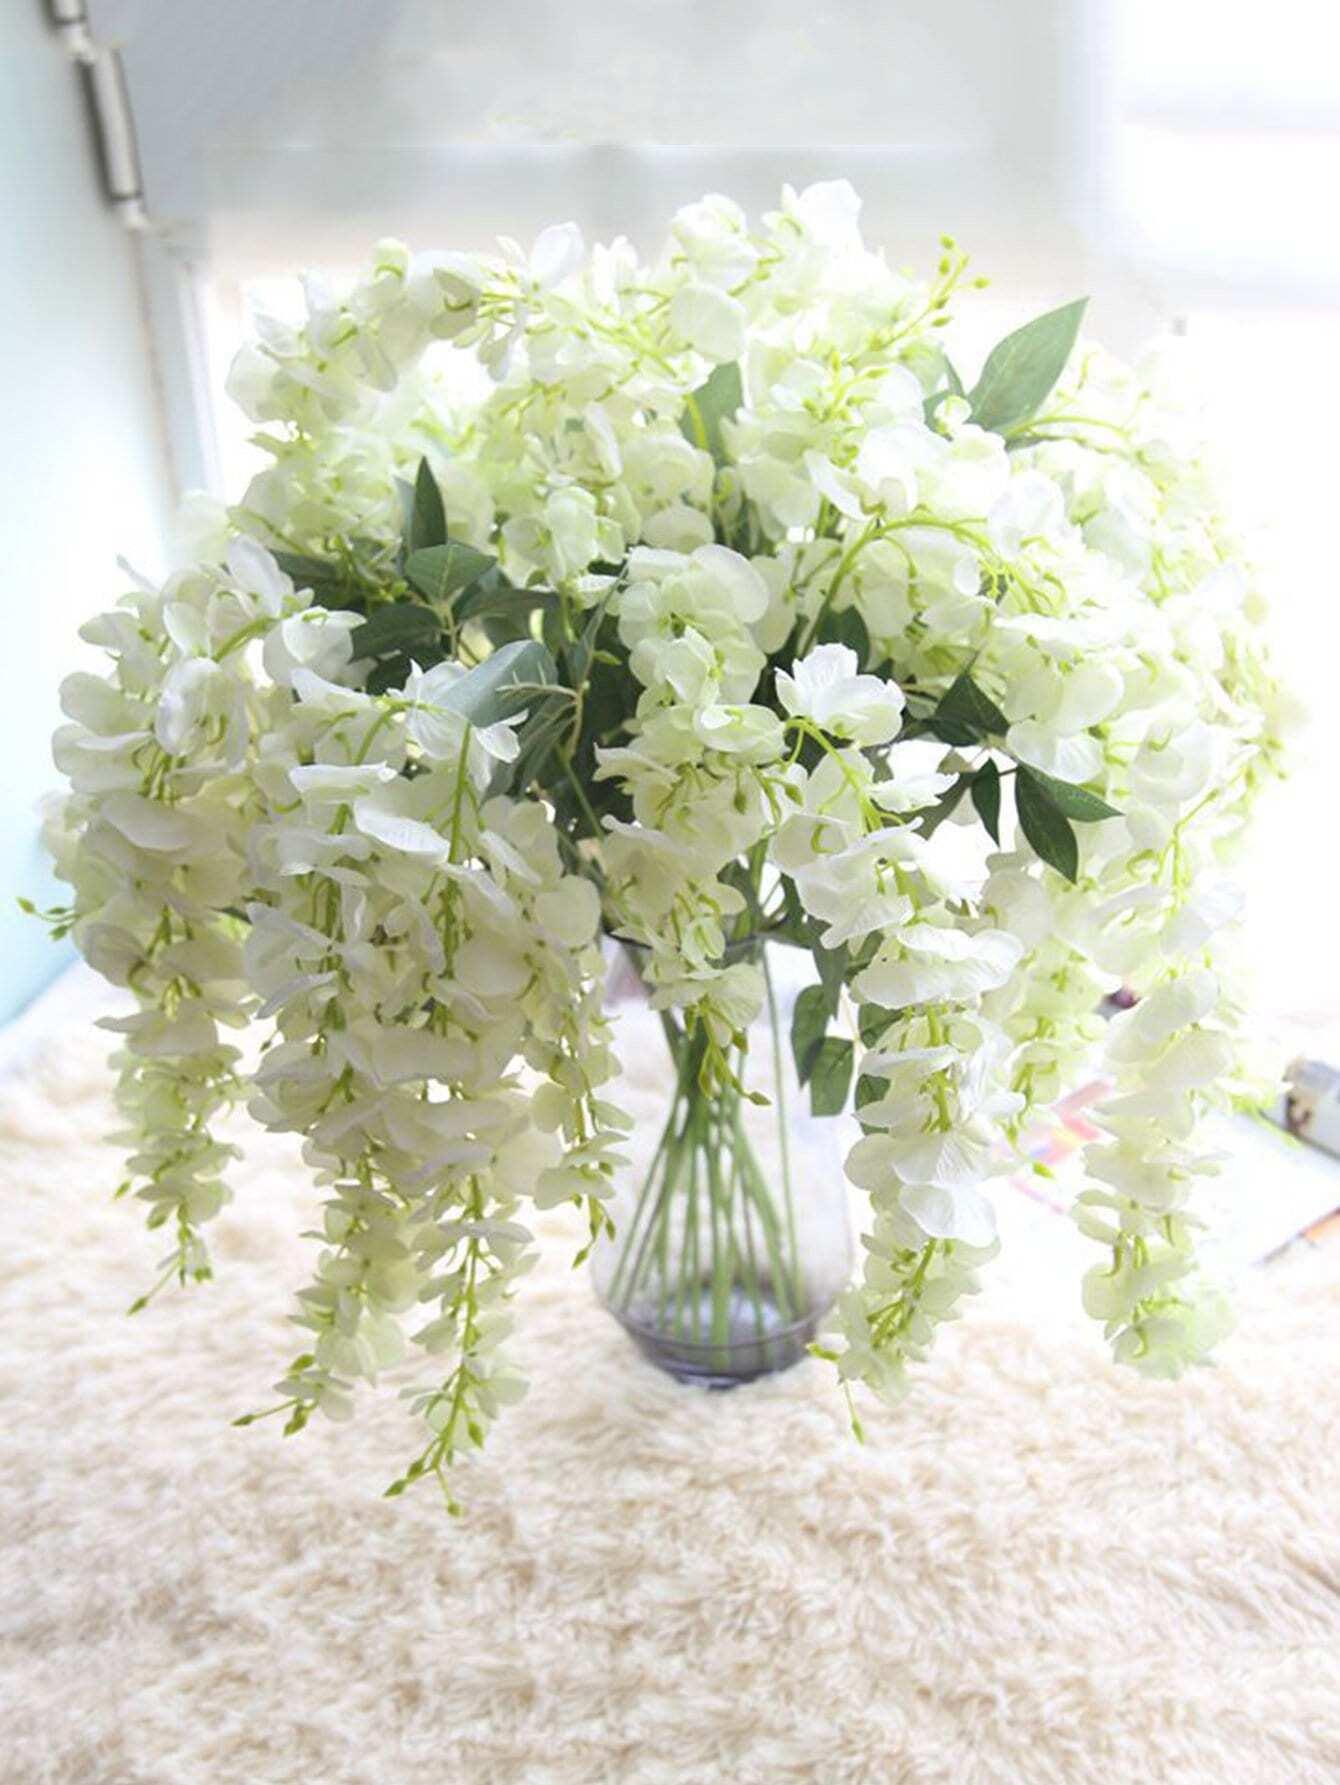 Artificial Wisteria Flowers Vine 1pc decorative wreaths flowers vine garland leaf